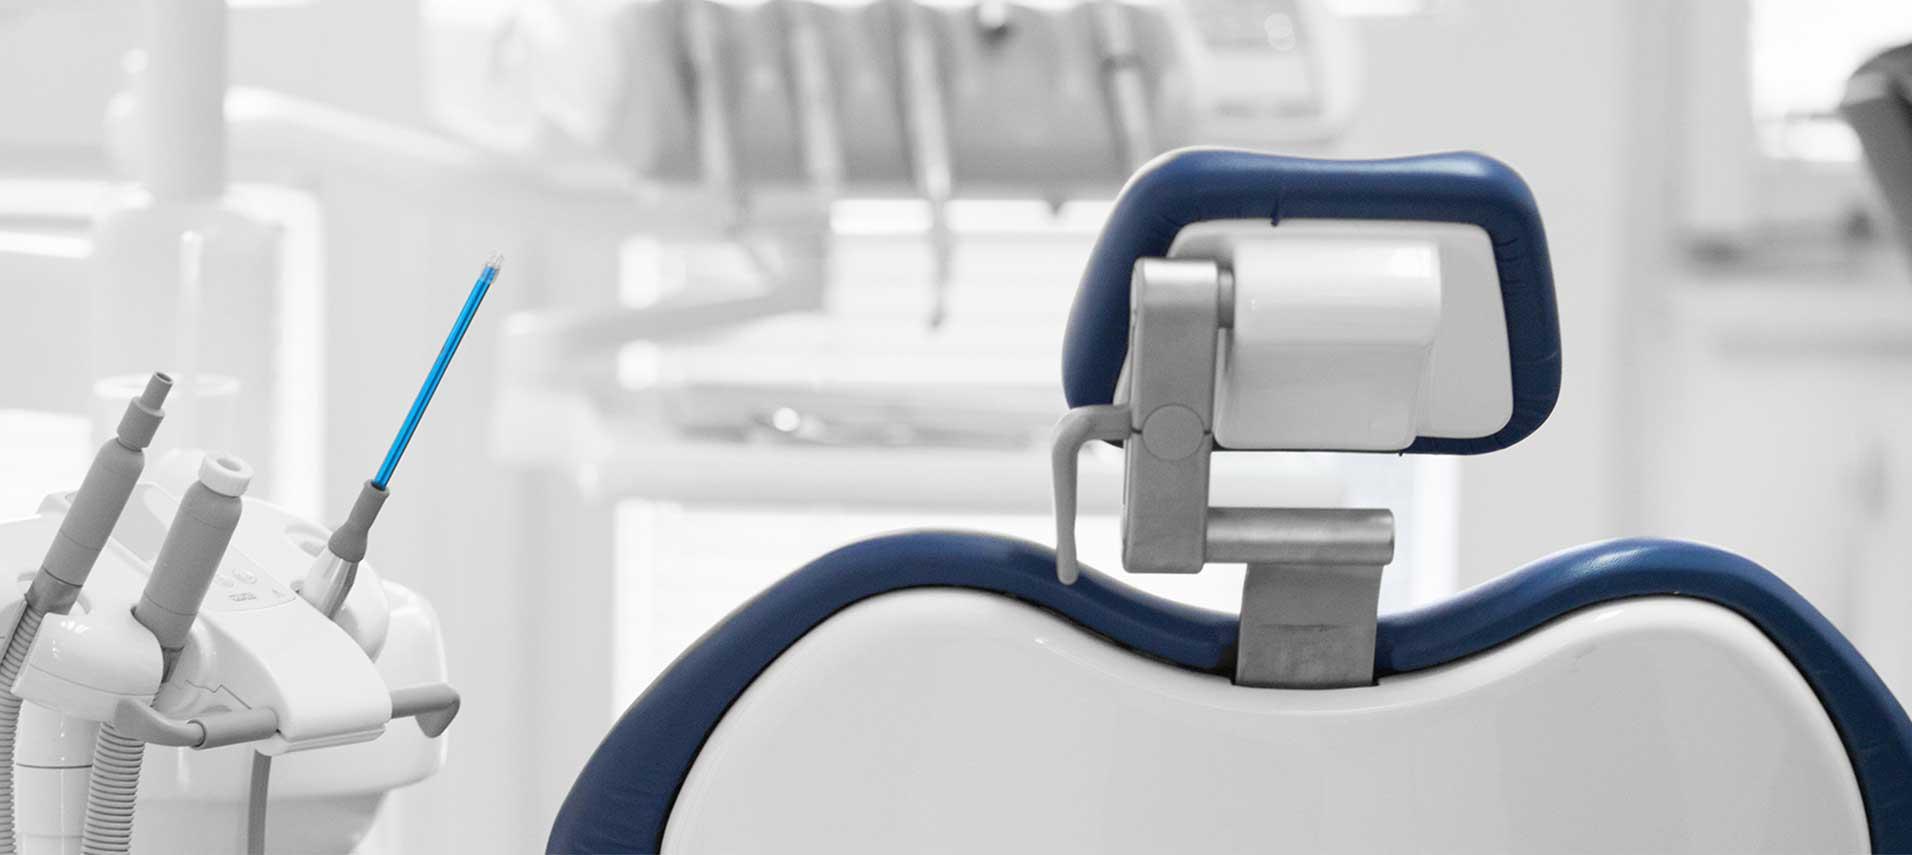 stomatoloska-ordinacija-vunjak-dental-clinic-stomatoloska-stolica